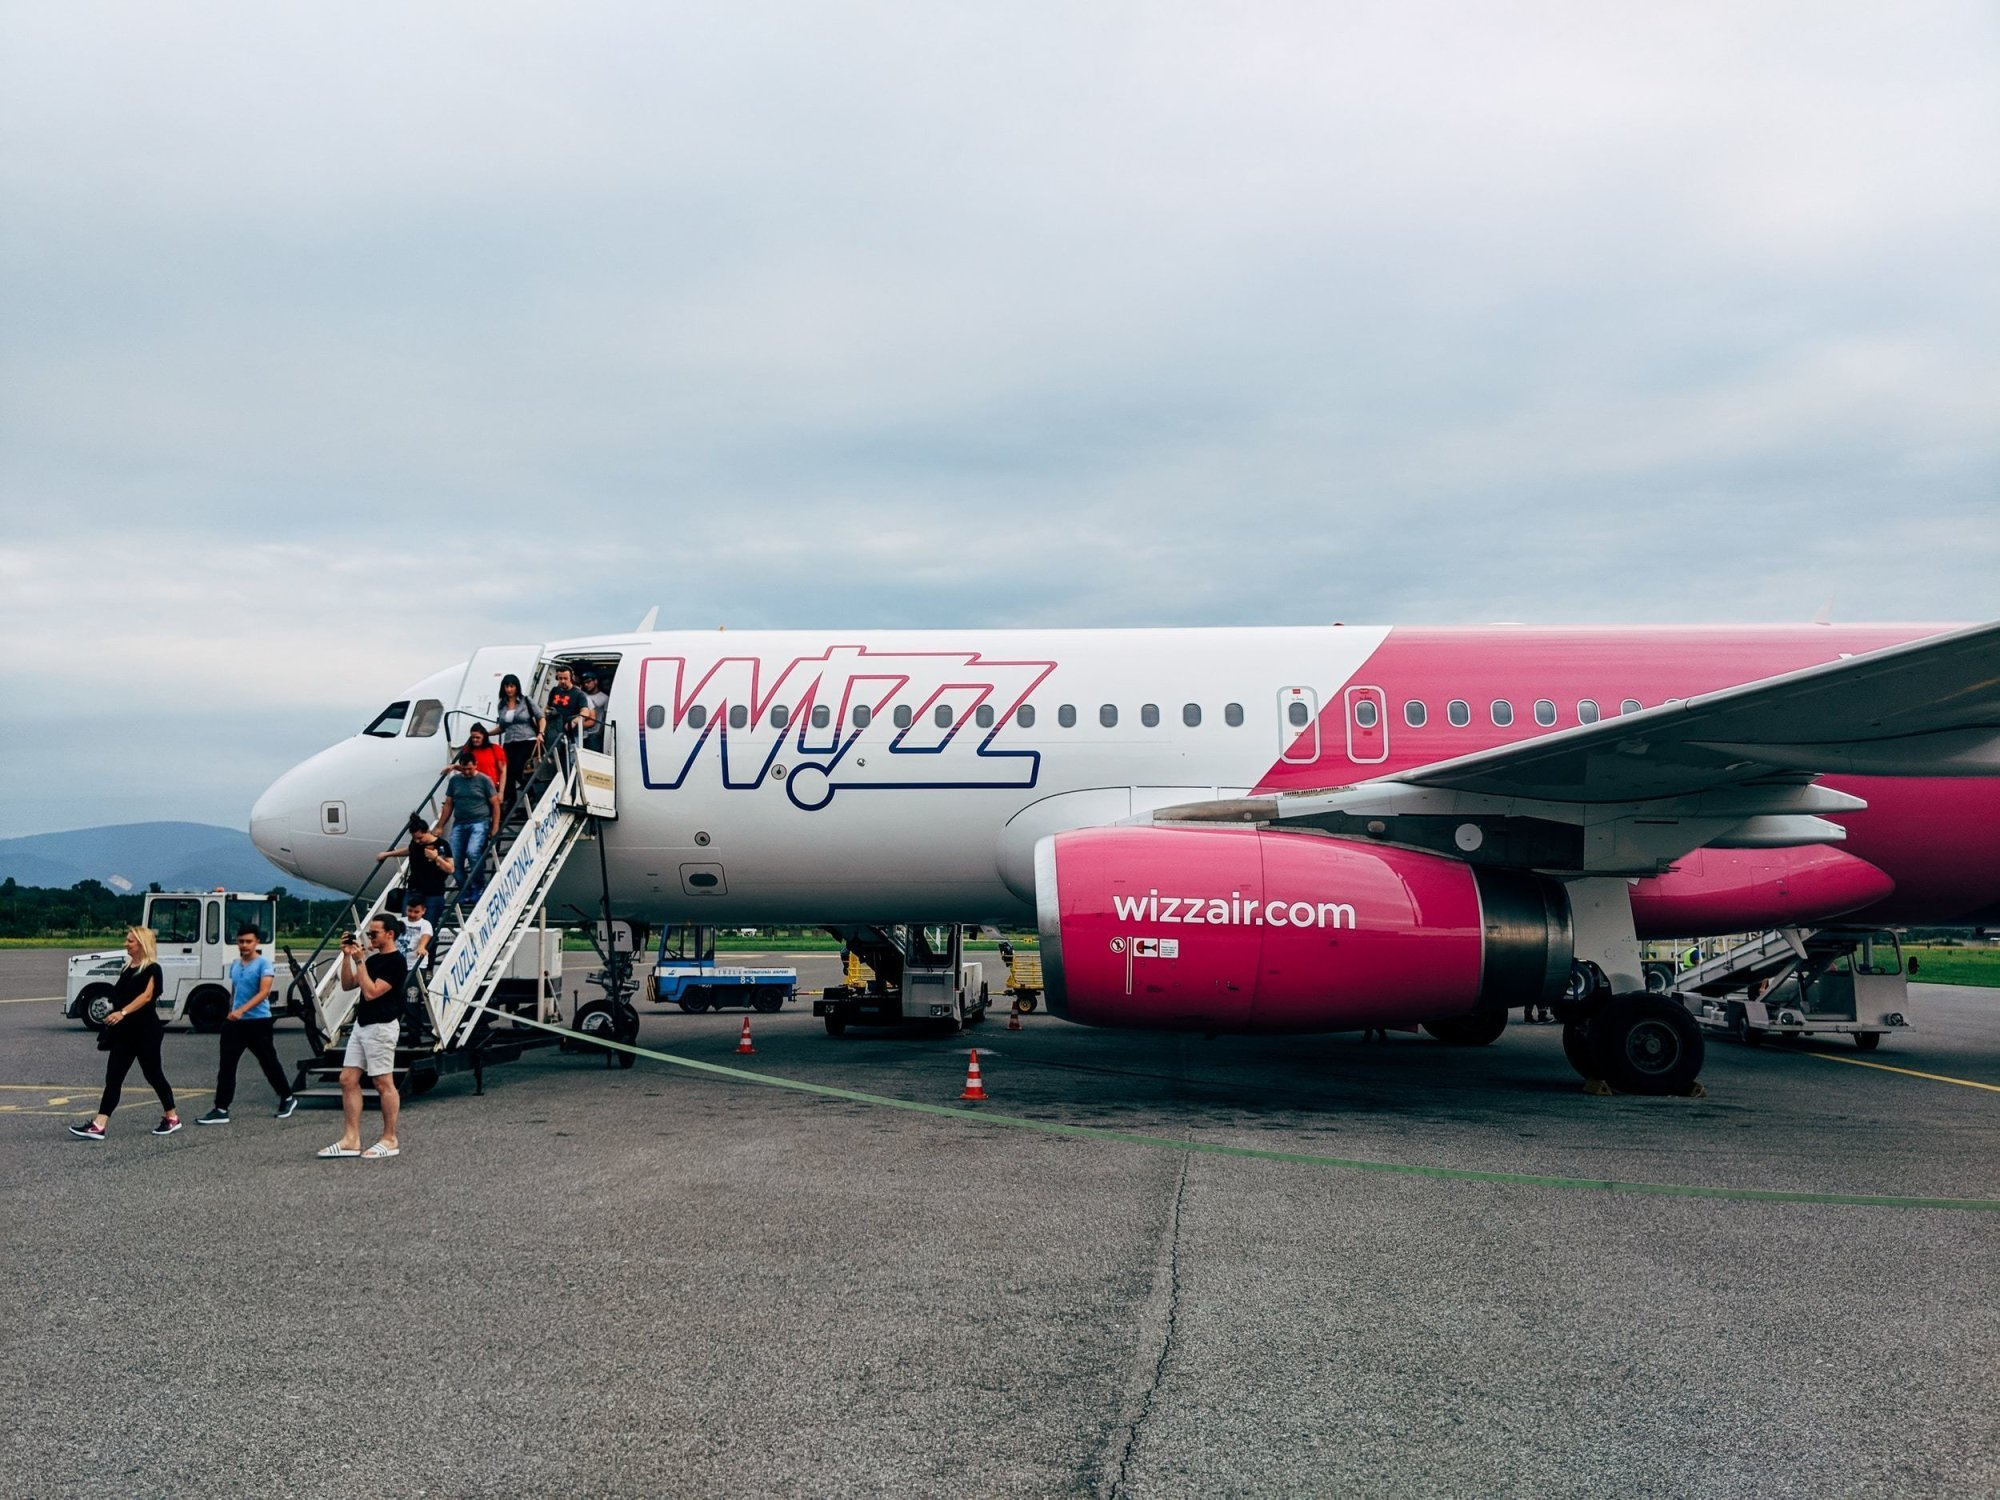 Wizz Air at St Petersburg Airport Pulkovo